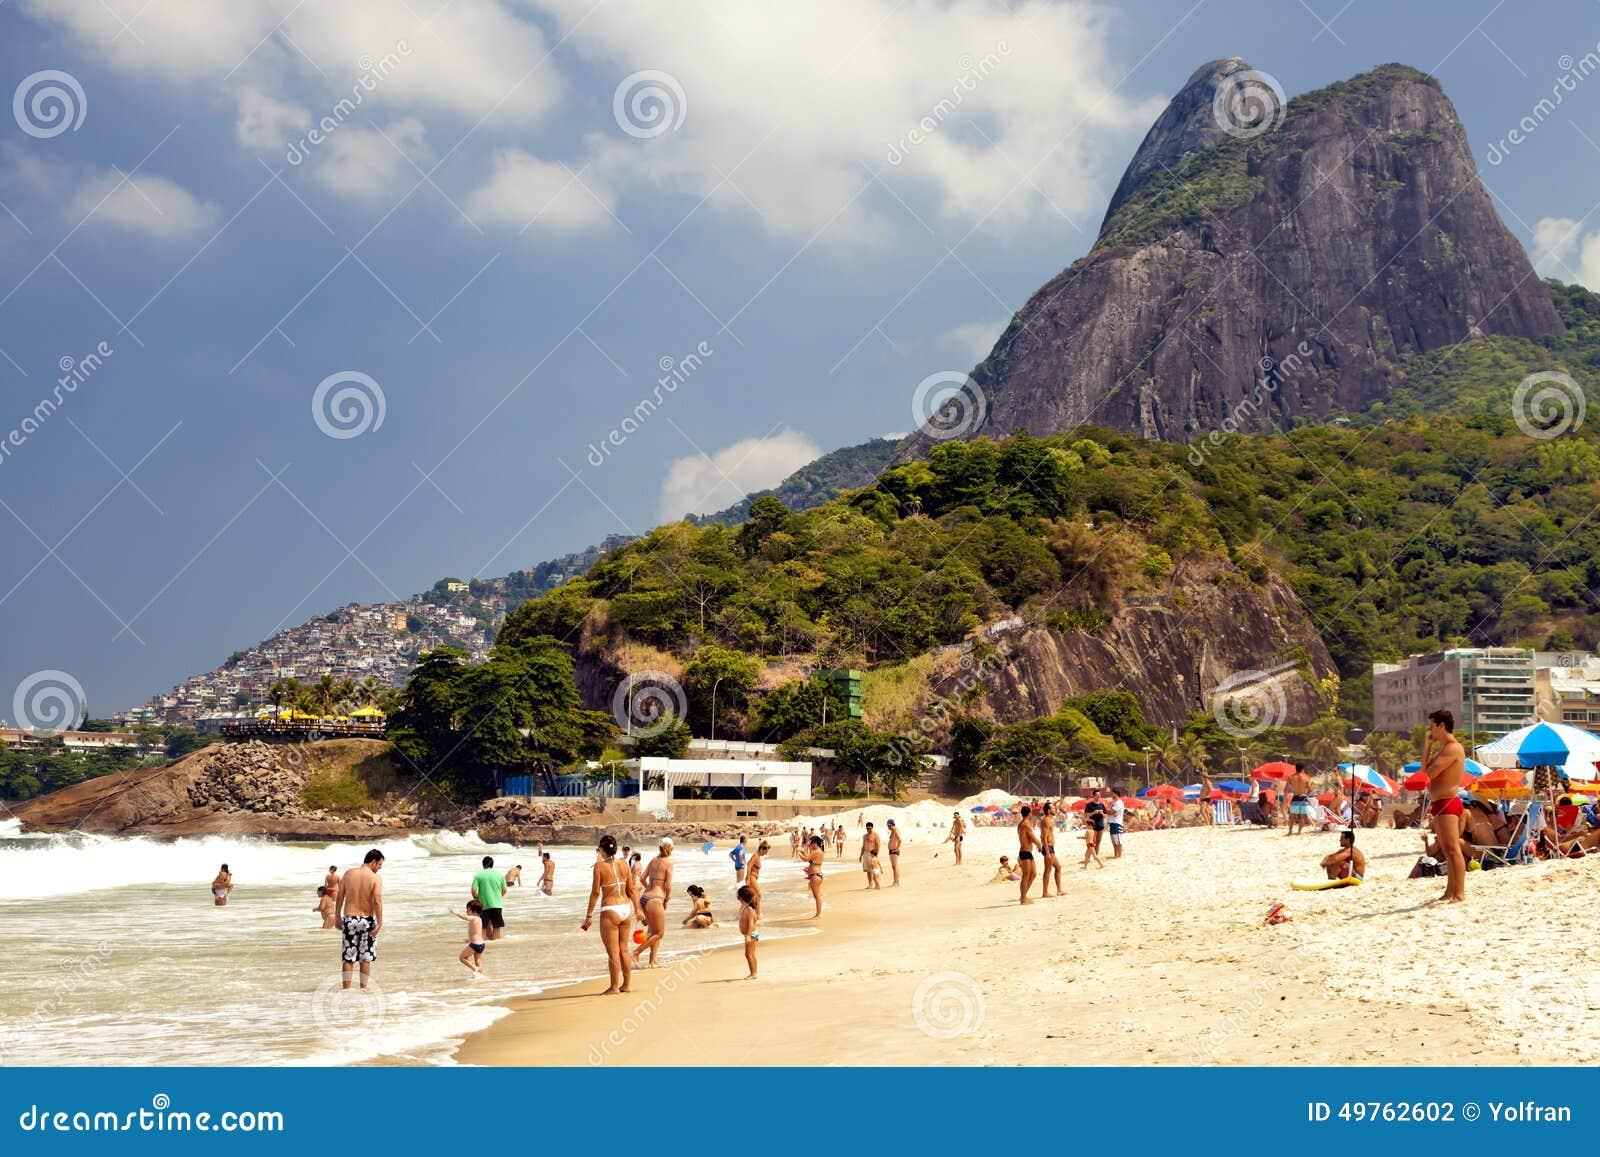 All not Bikini brazil contest de janeiro rio